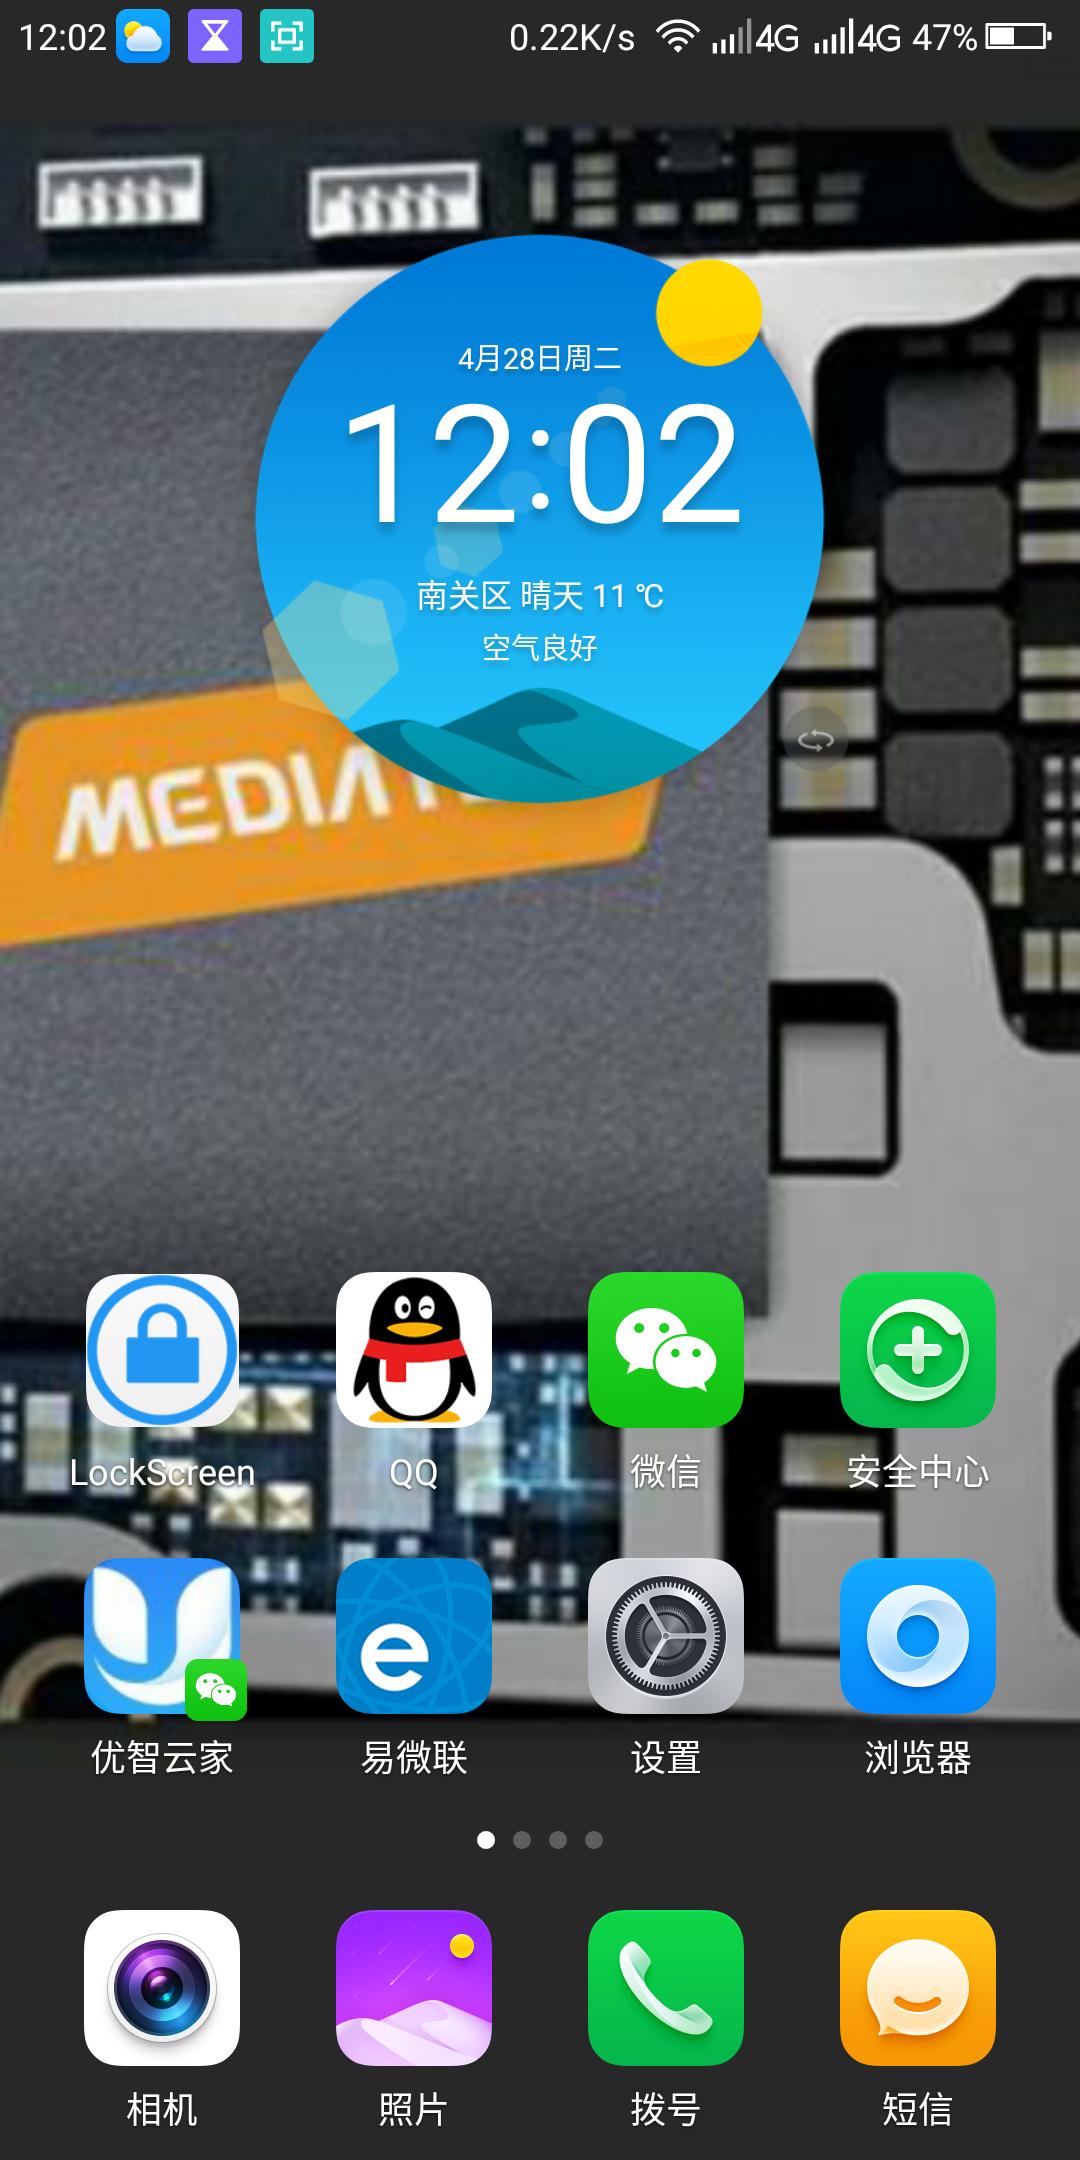 Screenshot_2020-04-28-12-02-57.png